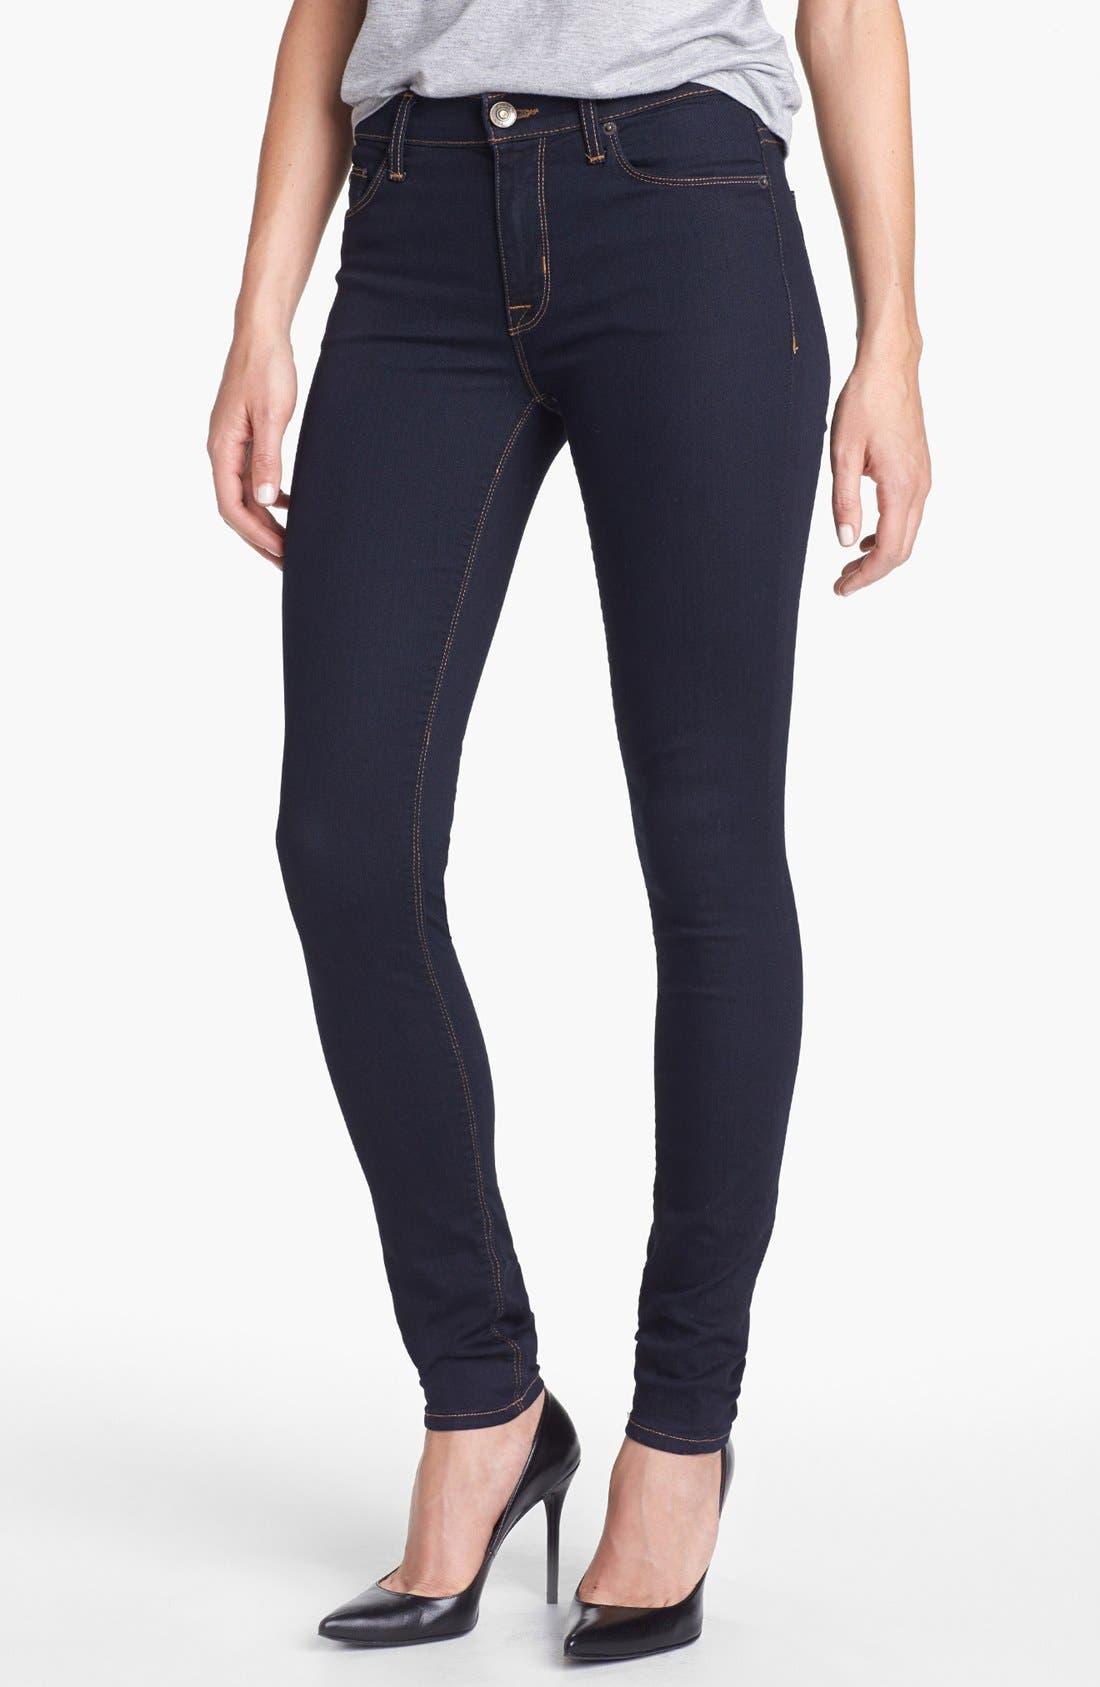 Main Image - Hudson Jeans 'Nico' Super Skinny Jeans (Storm)